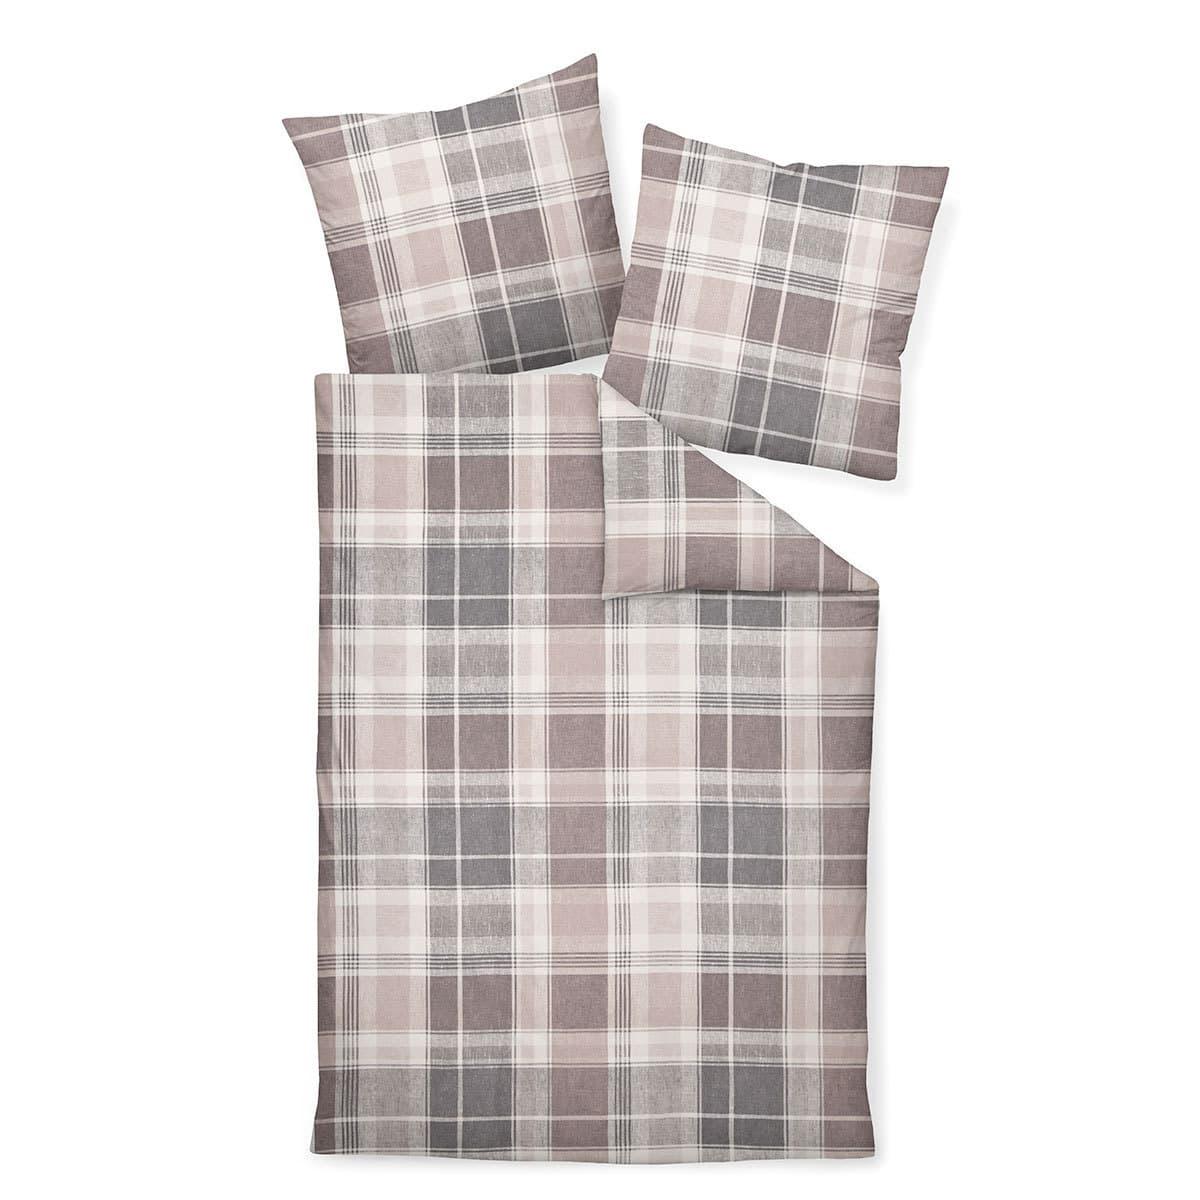 janine feinbiber bettw sche davos 65014 07 g nstig online. Black Bedroom Furniture Sets. Home Design Ideas